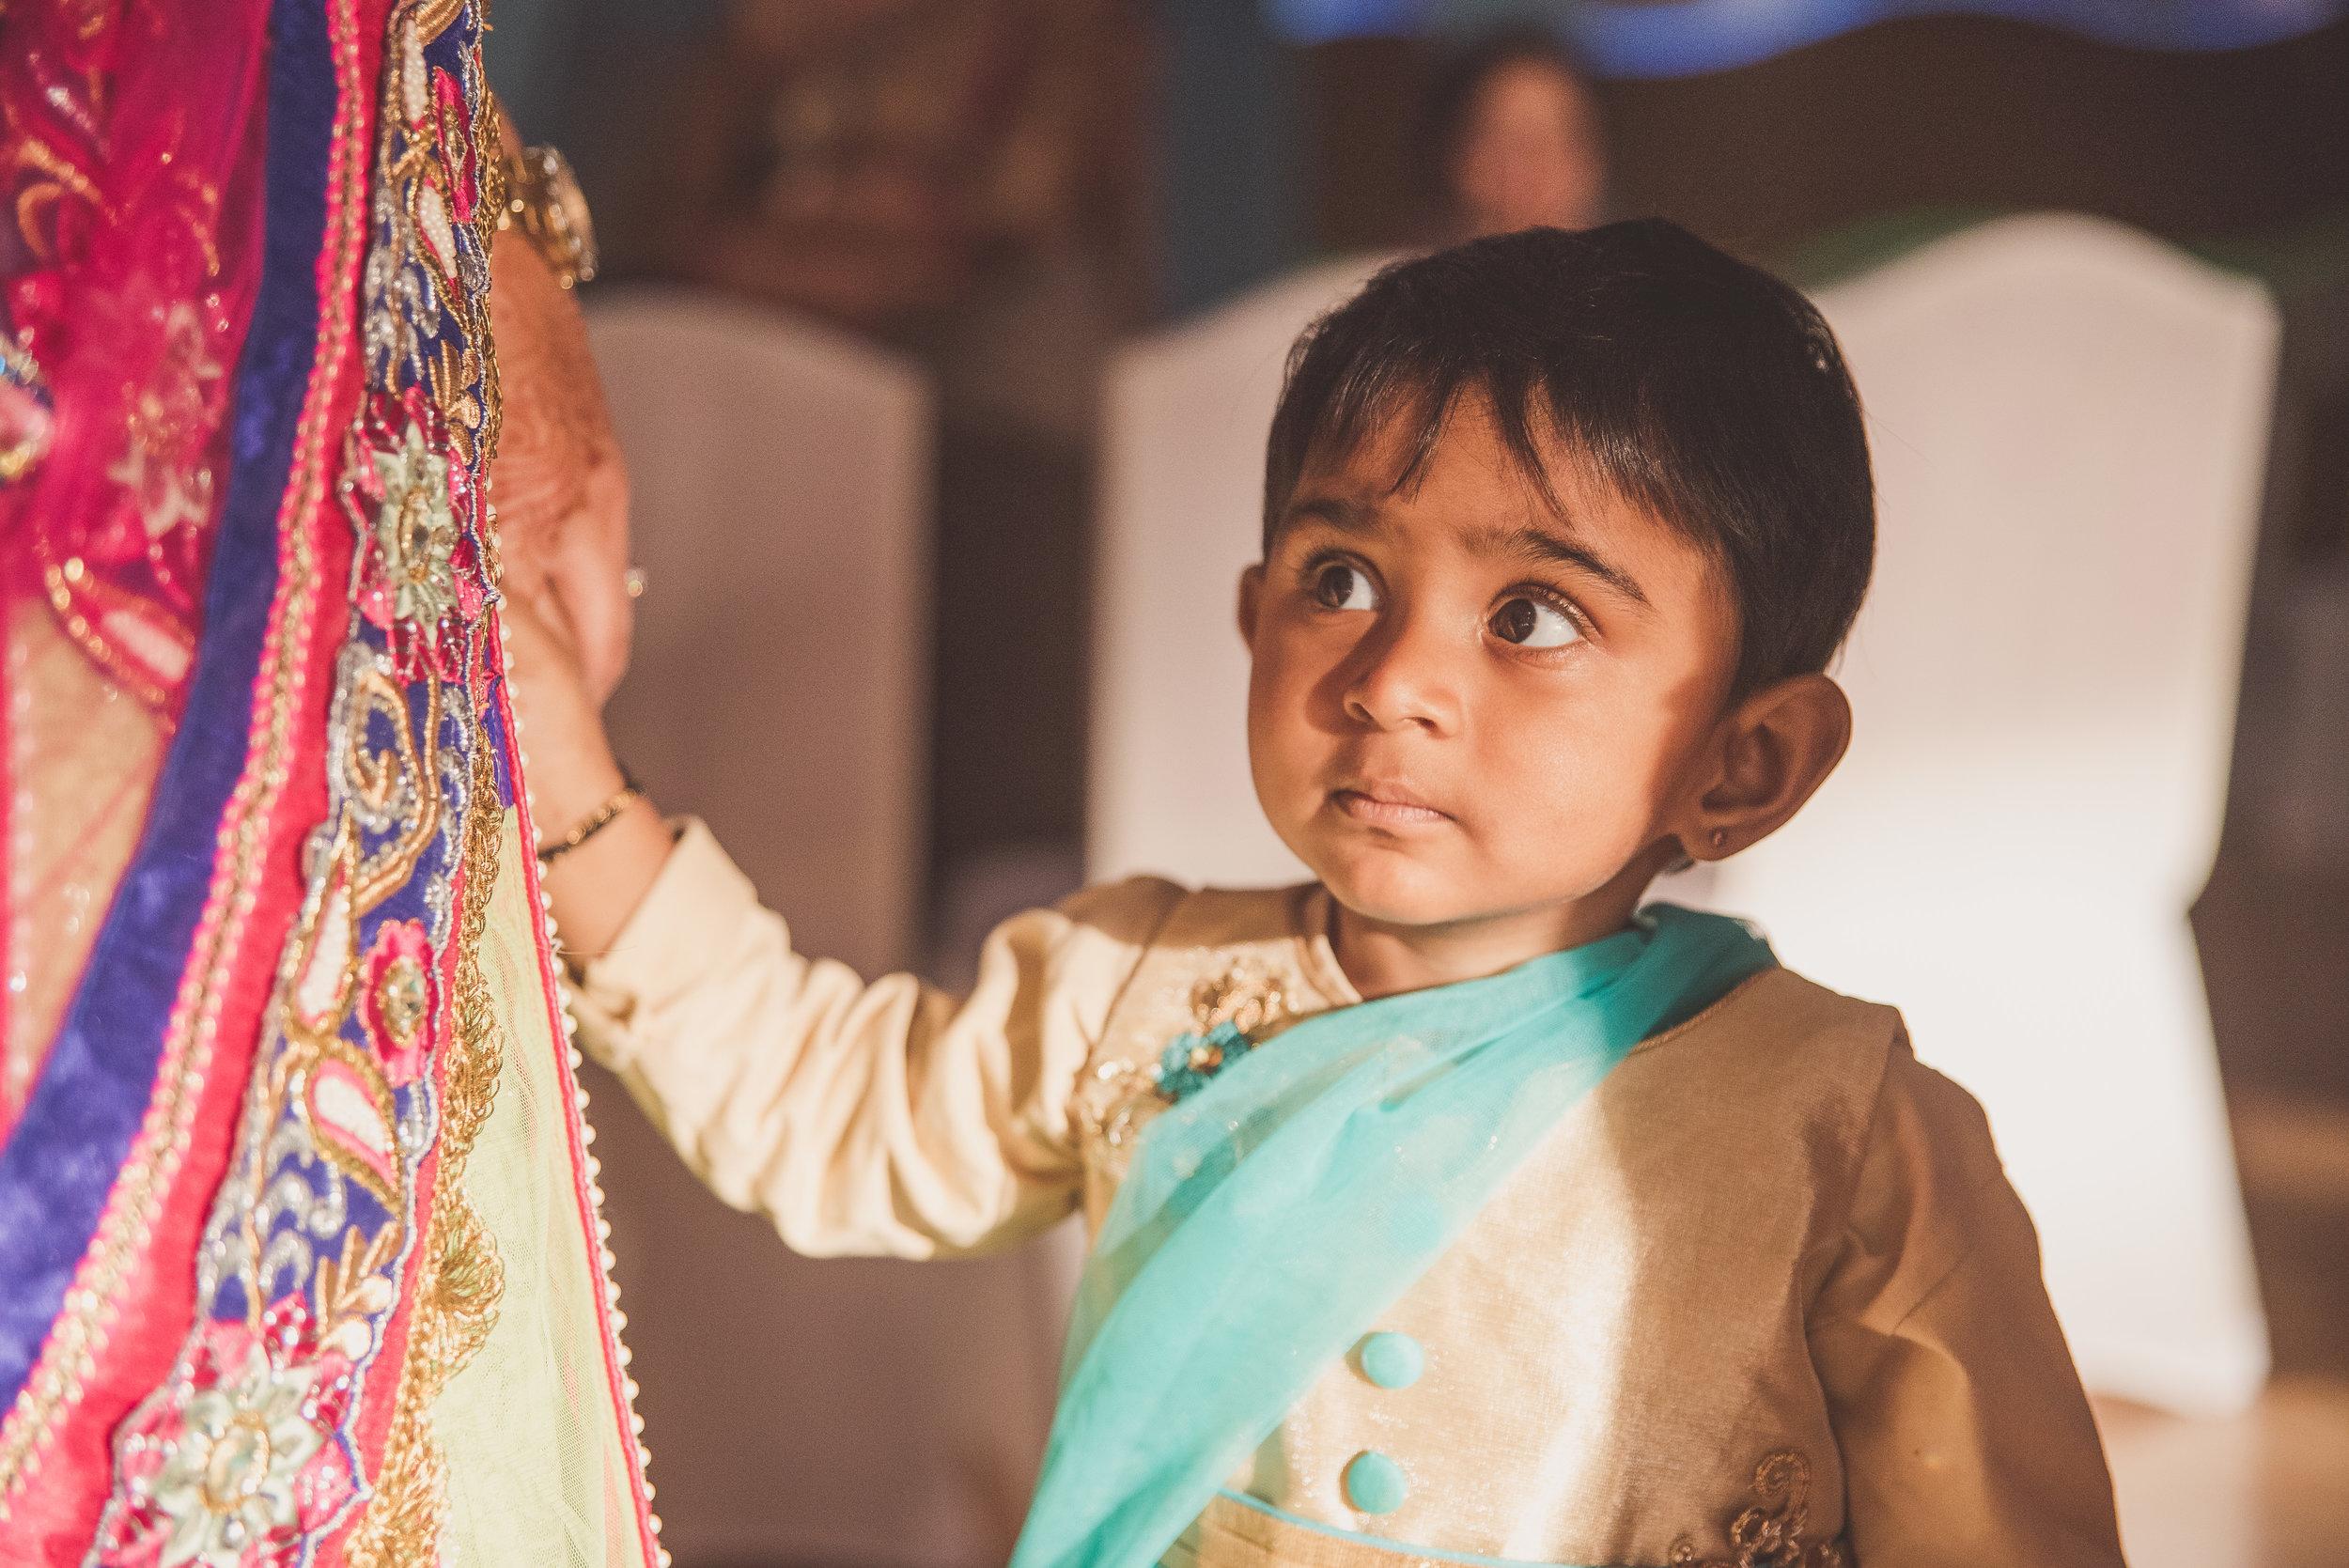 Hindu girl at wedding